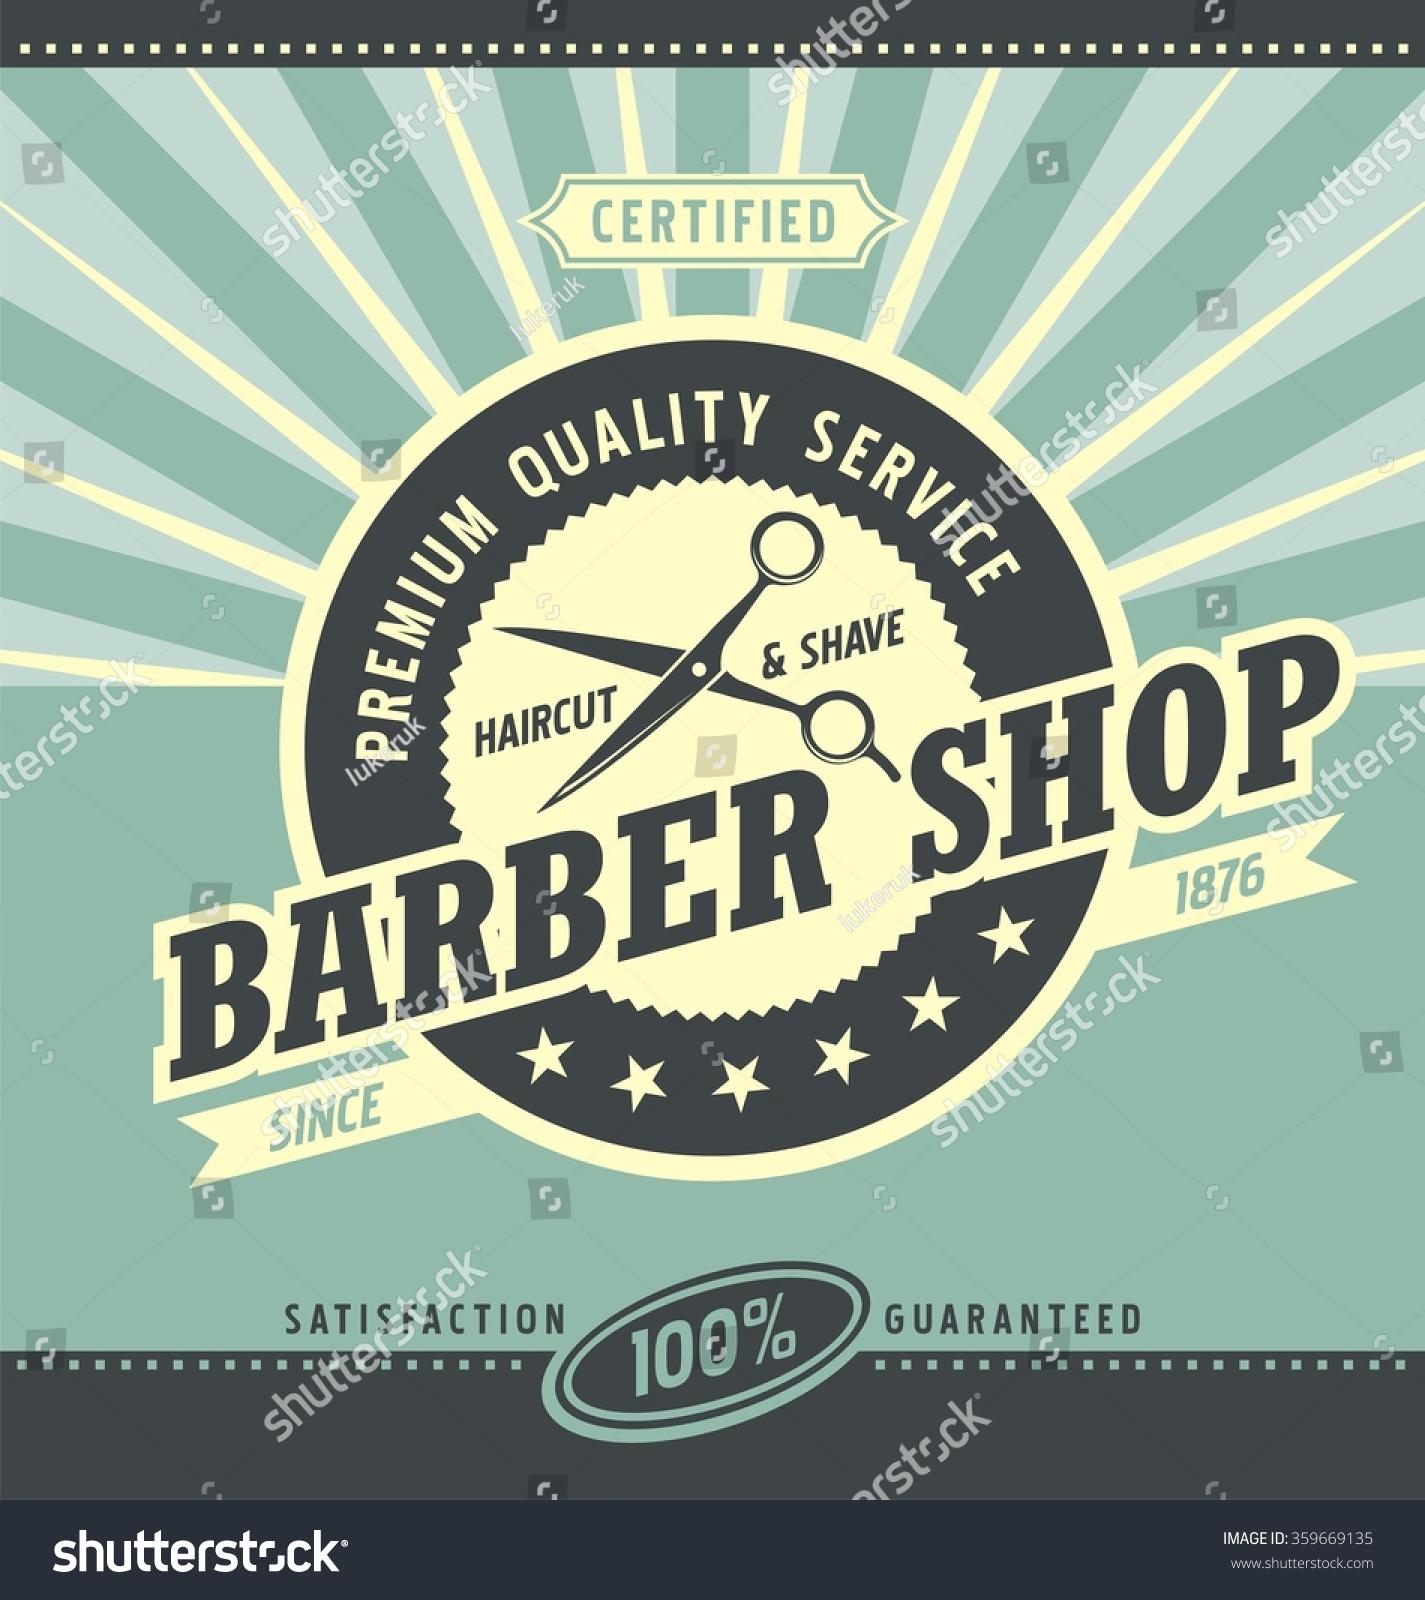 Barber Shop Retro Poster Design Template Stock Vector